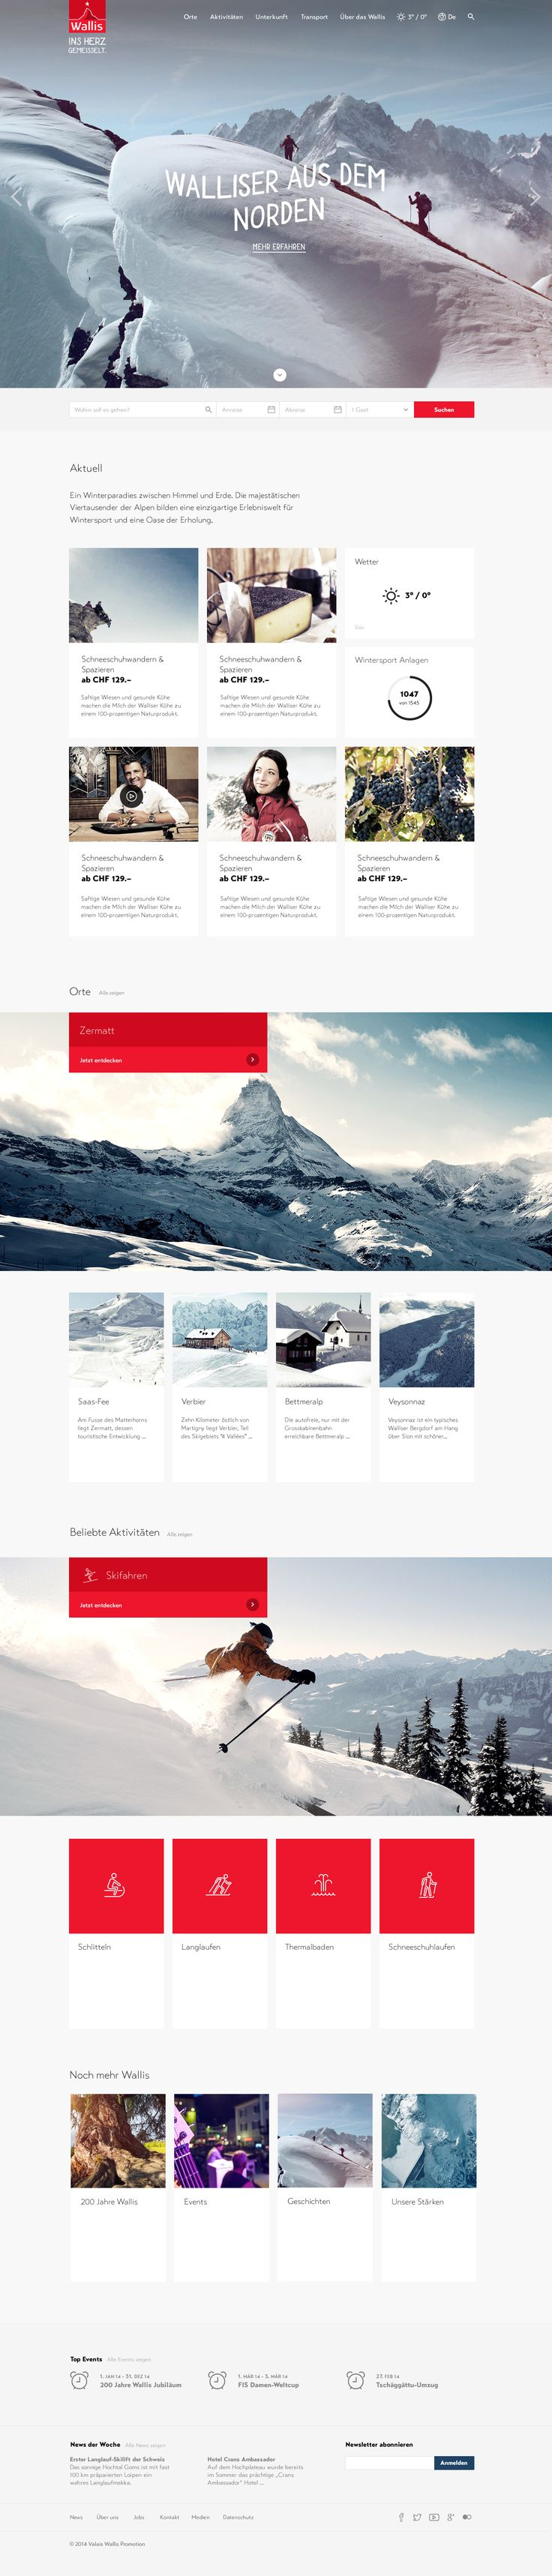 Relaunch Wallis.ch #webdesign #hinderlingvolkart #design #indentity #ux #ui #winter #summer #tourismus #destinations #mountain